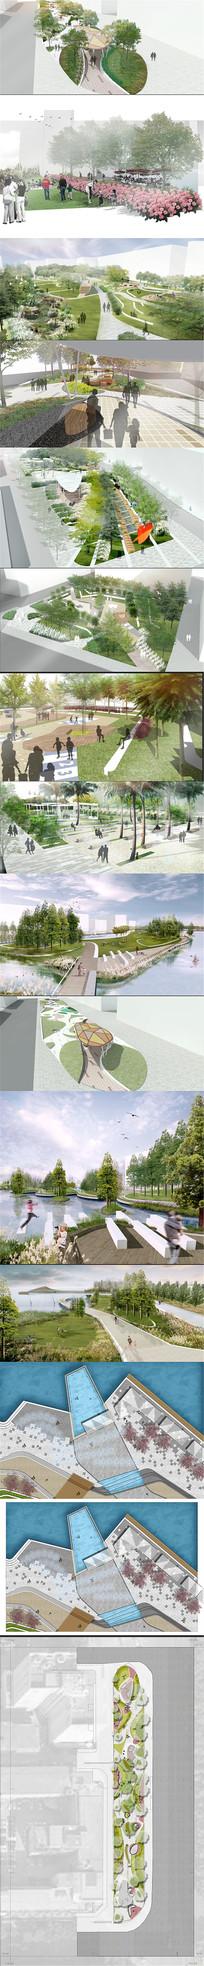 PSD分层国际竞赛风格公园滨水湿地